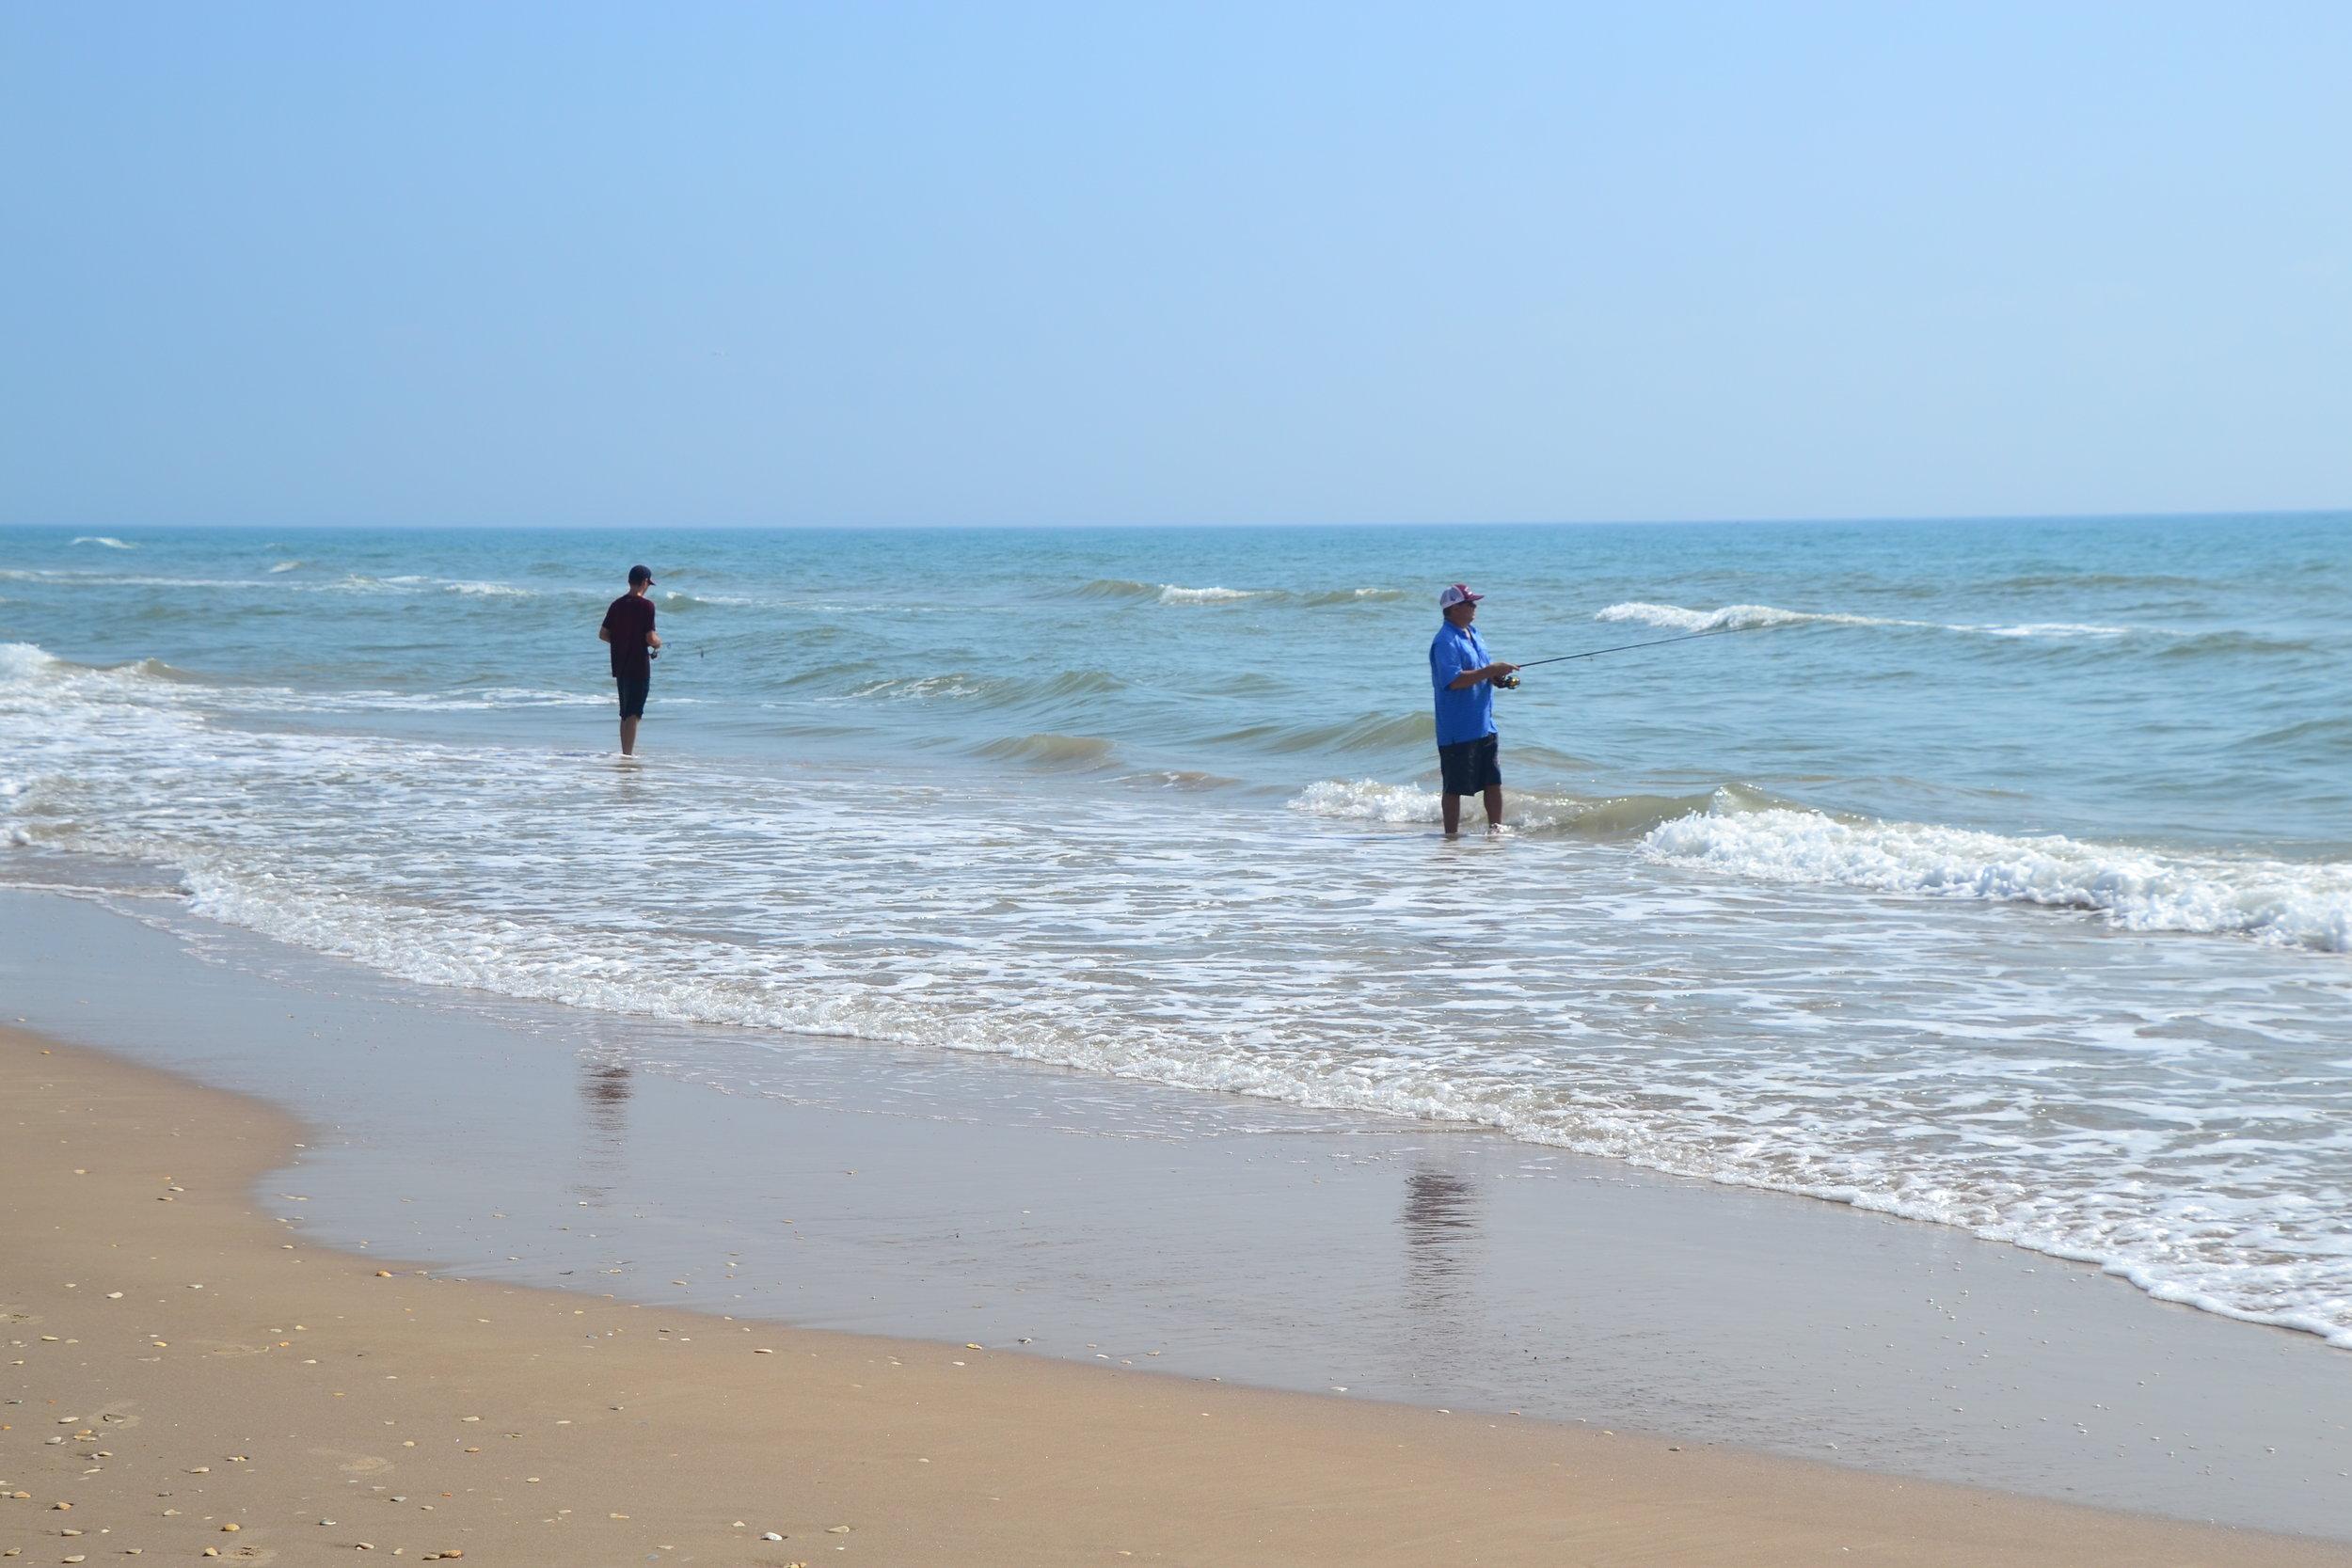 Surf fishing!